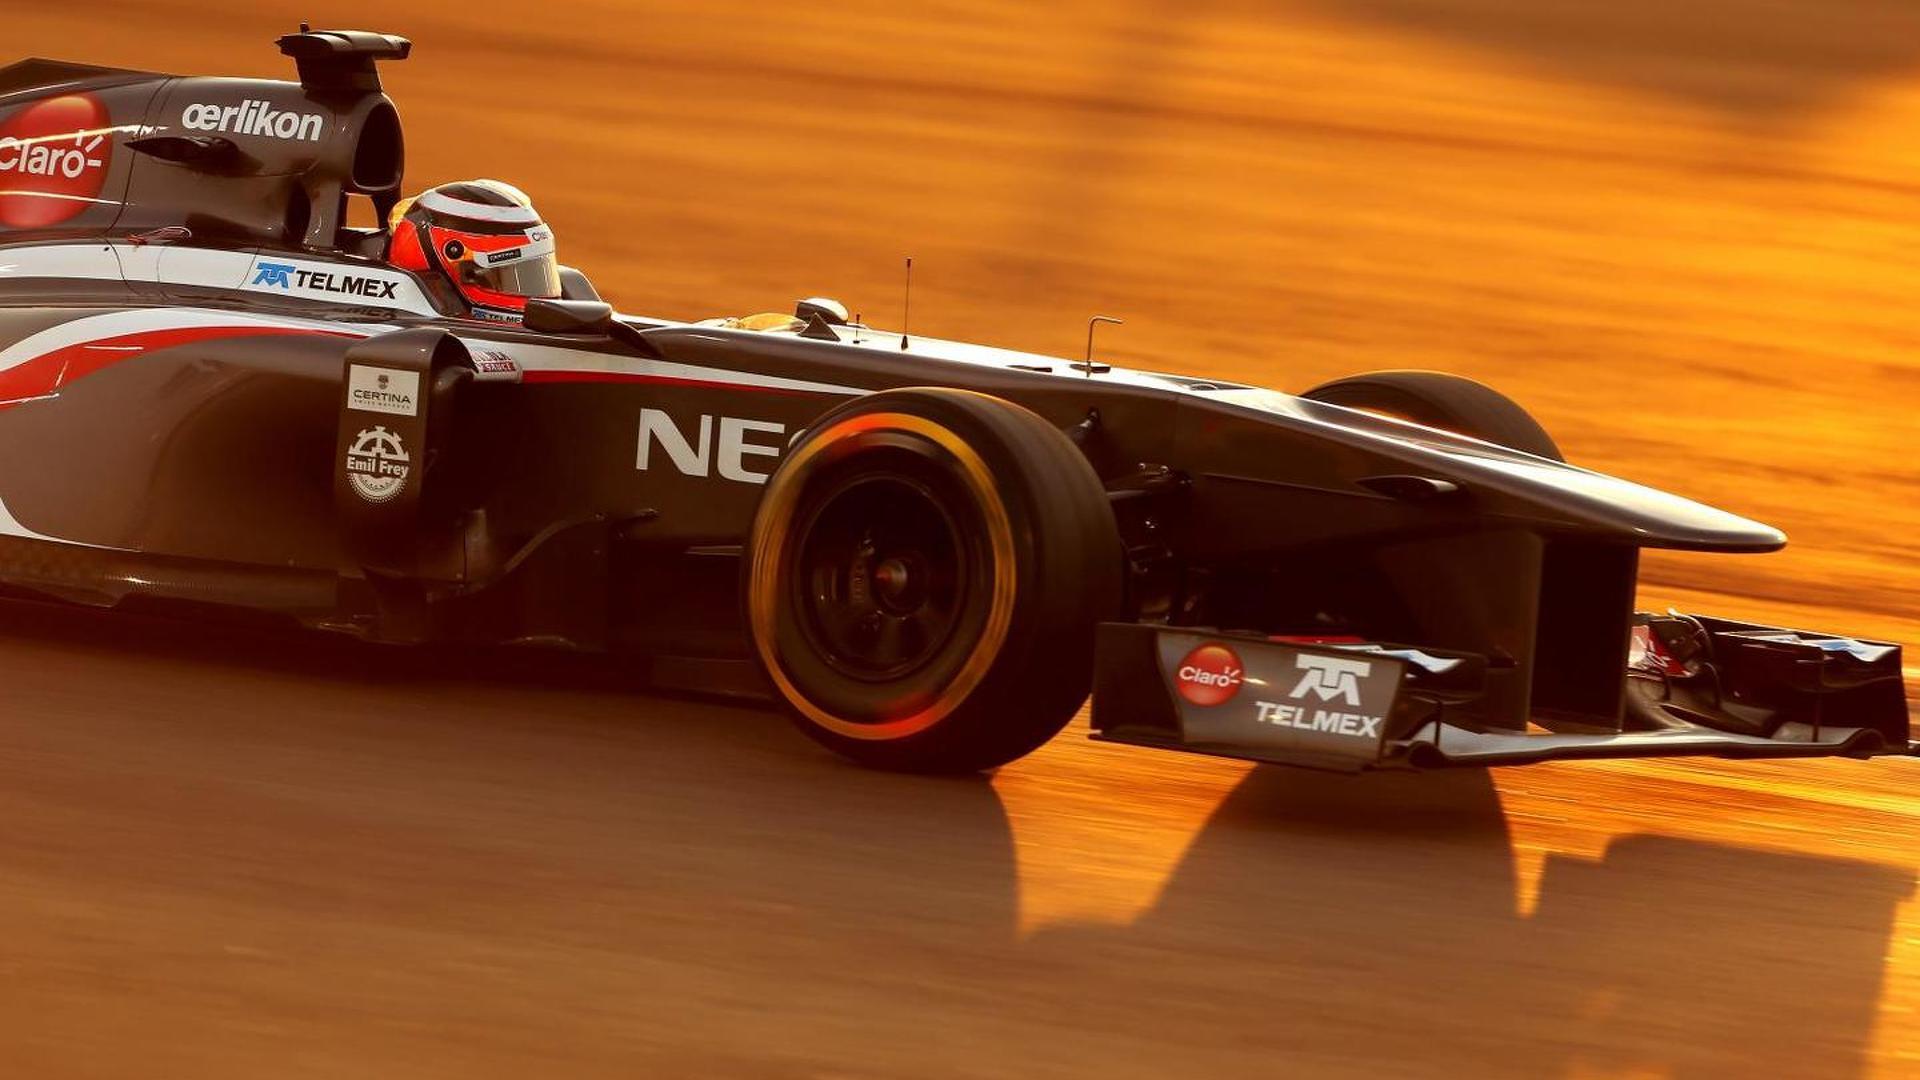 Hulkenberg 'not paid a penny' - Vettel